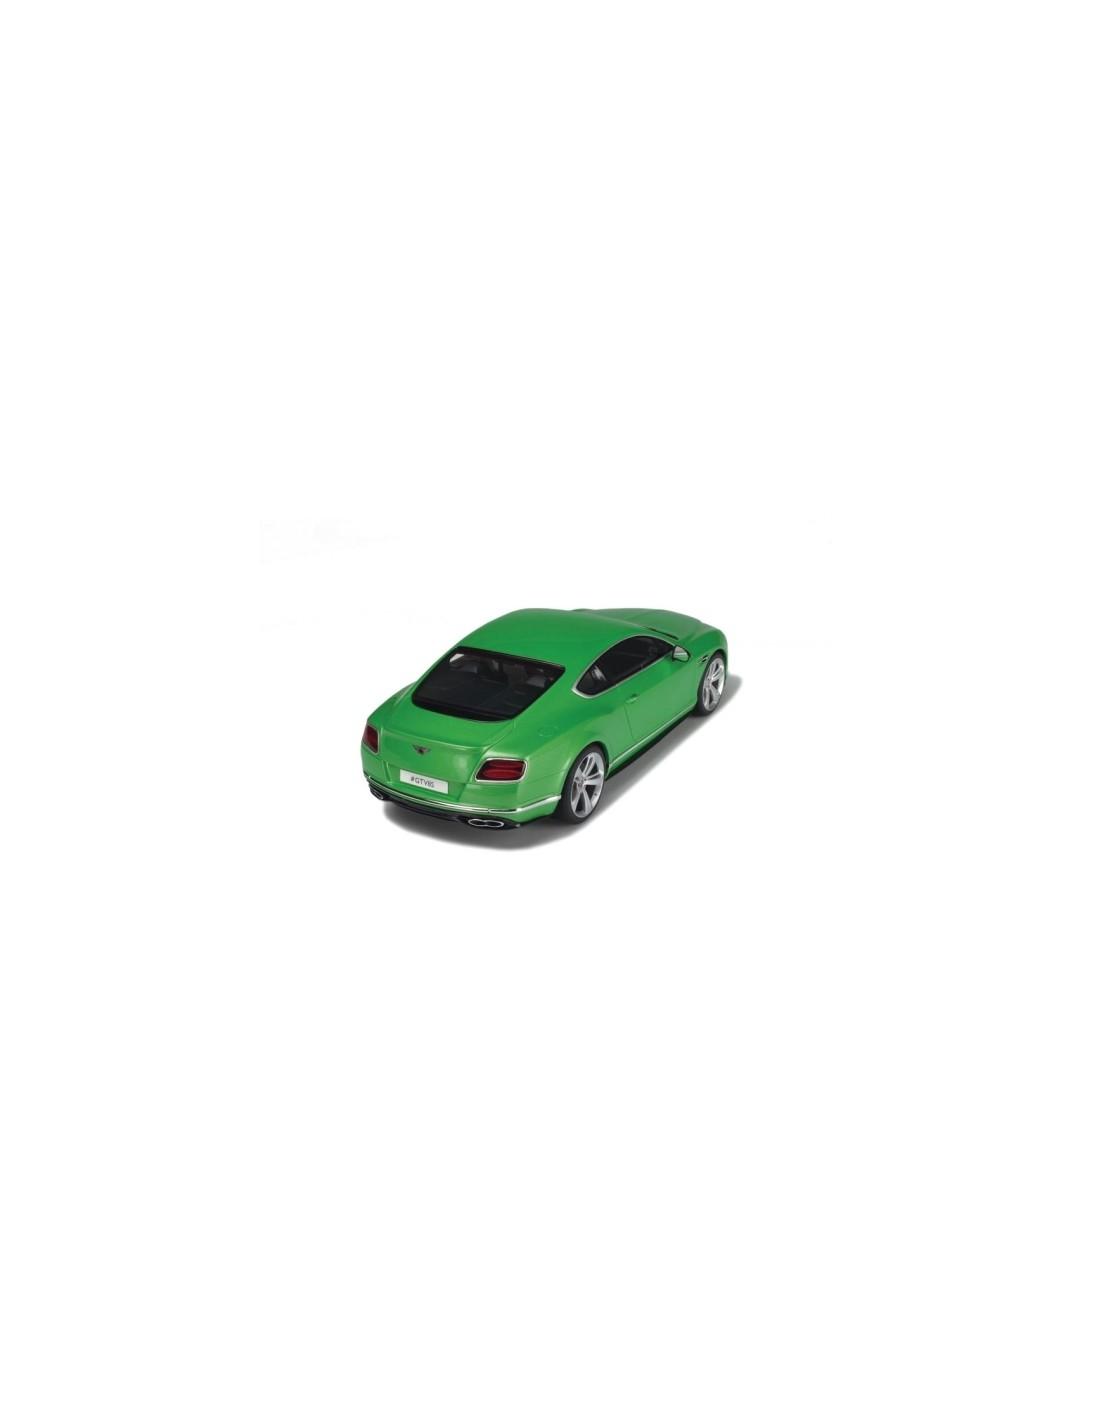 GT Spirit GT077 1/18 Bentley Continental GT V8 S